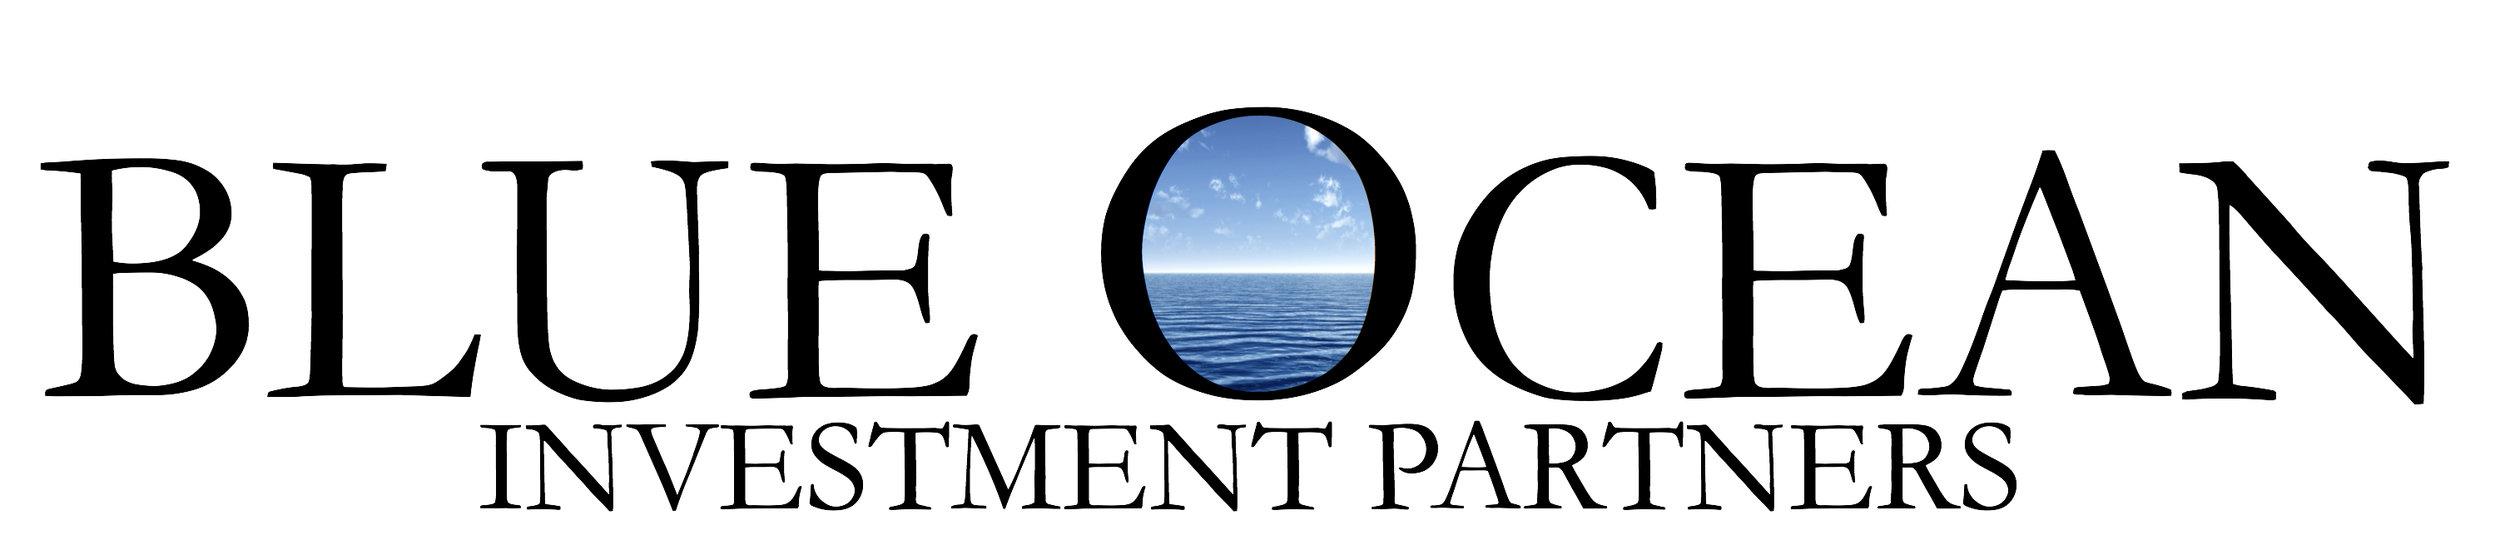 Blue Ocean Investment Partners logo